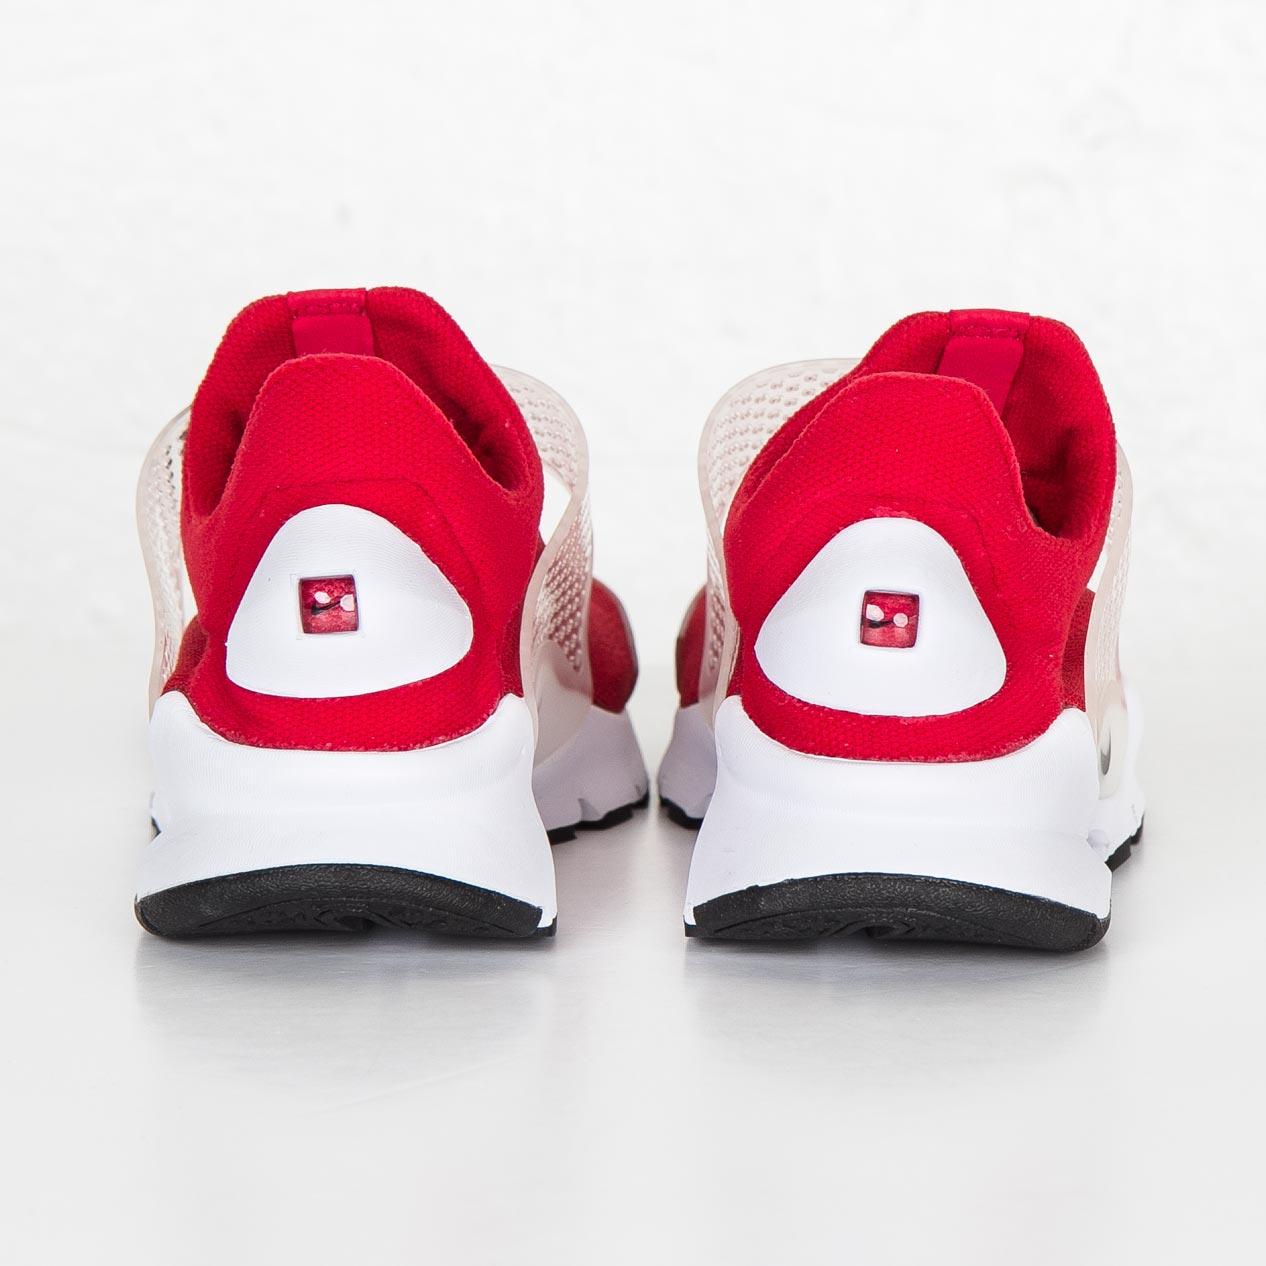 450bd162ecc Nike Sock Dart - 819686-601 - Sneakersnstuff